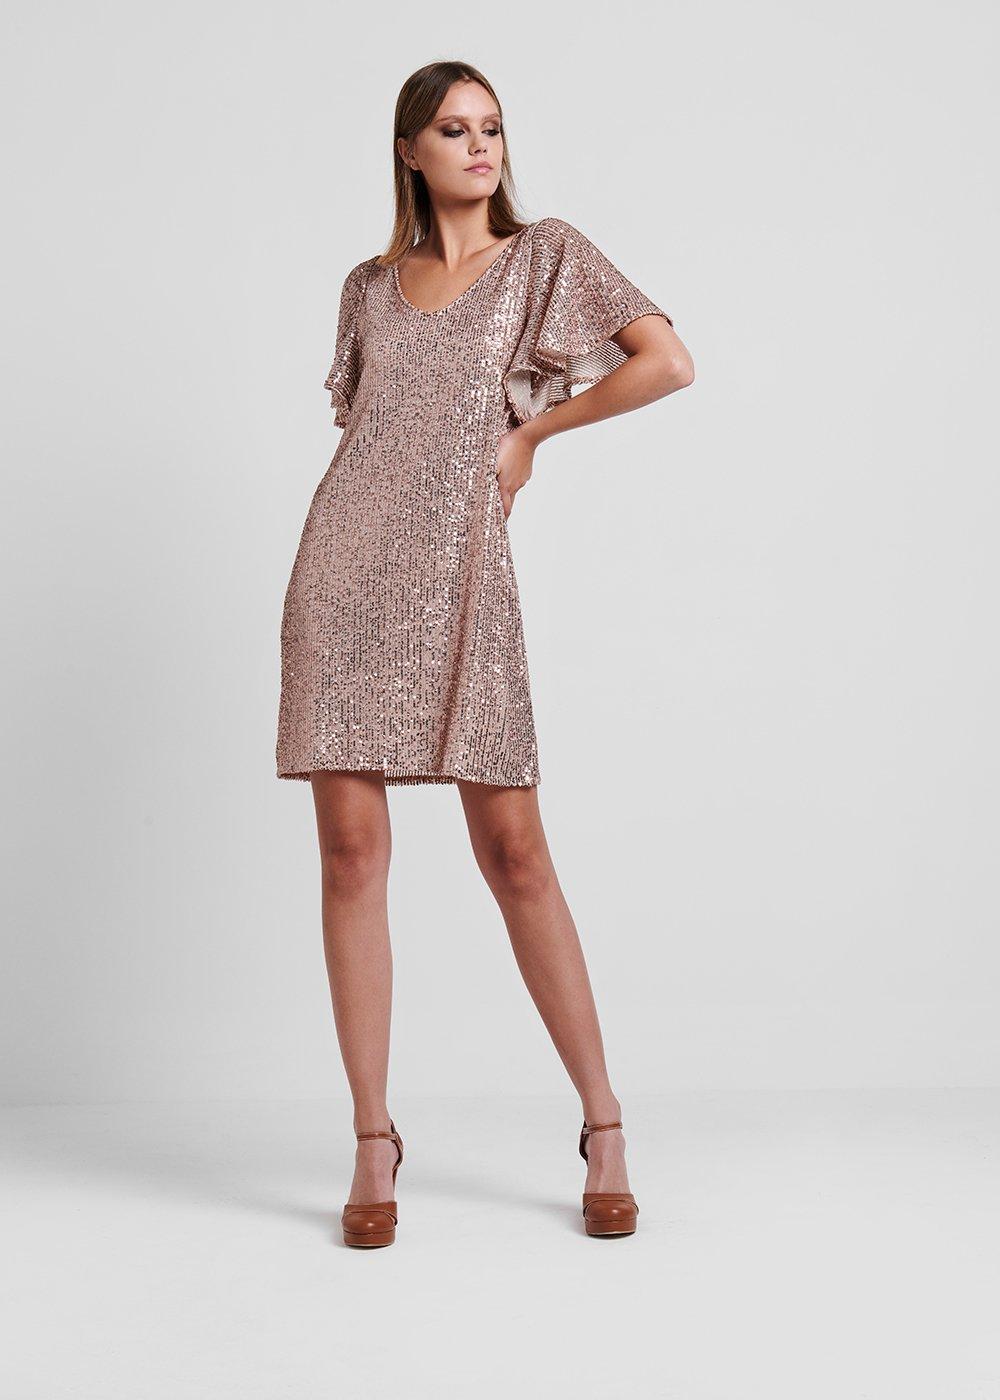 Light gold rose Adriano dress - Rosette - Woman